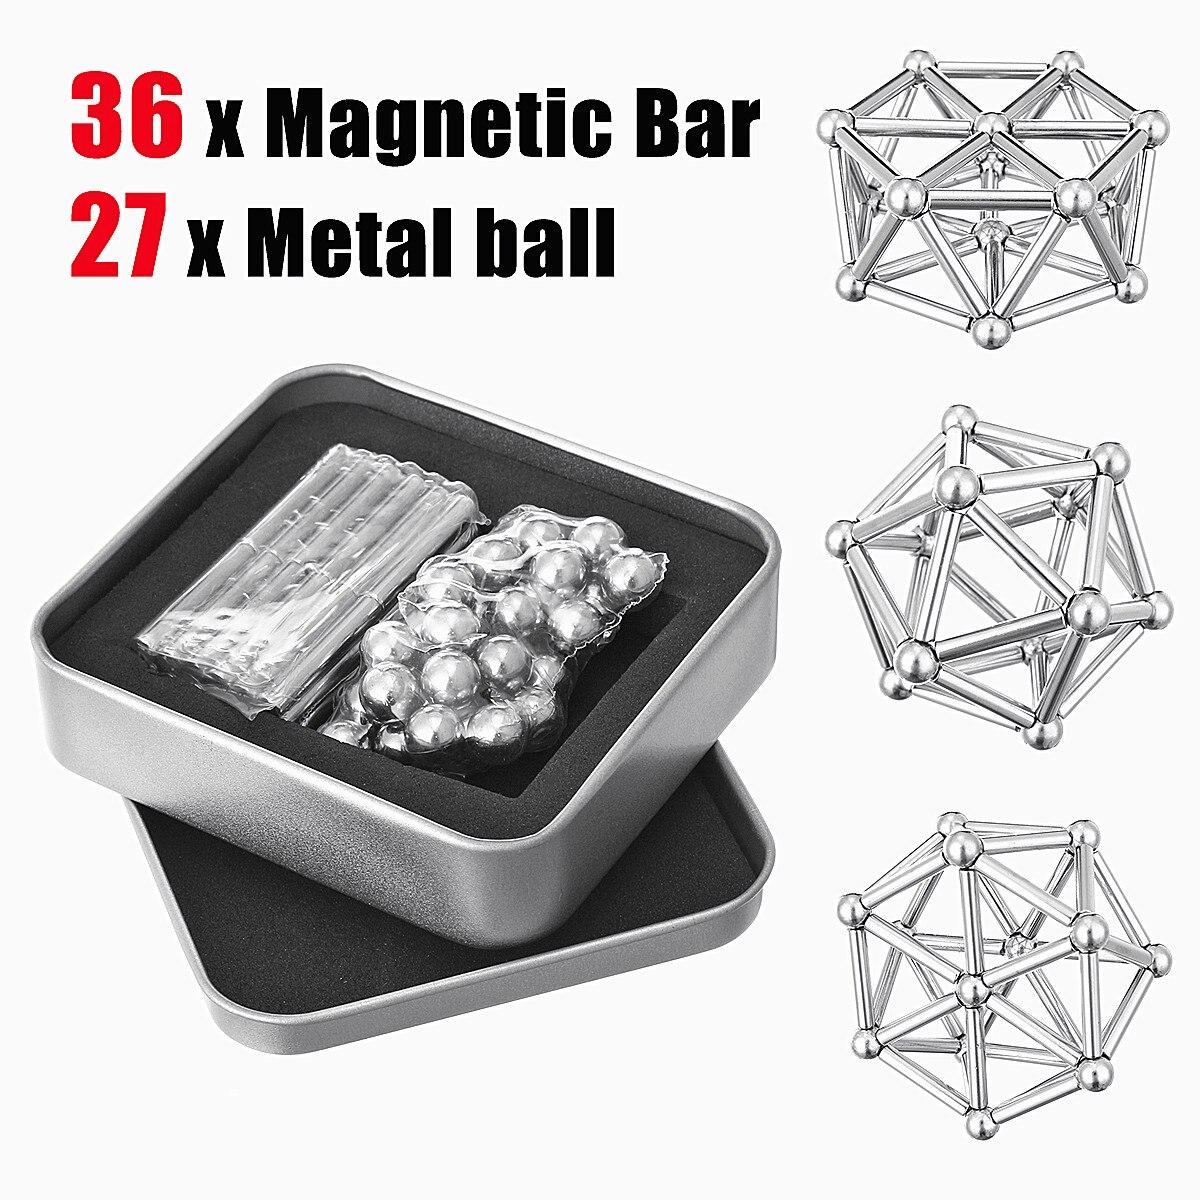 63Pcs Neodymium Magnetic Bars Metal Balls Permanent Magnet Pressure Relief Neodymium Magnet 8mm neodymium magnet sphere steel balls diy puzzle set silver 20 pcs